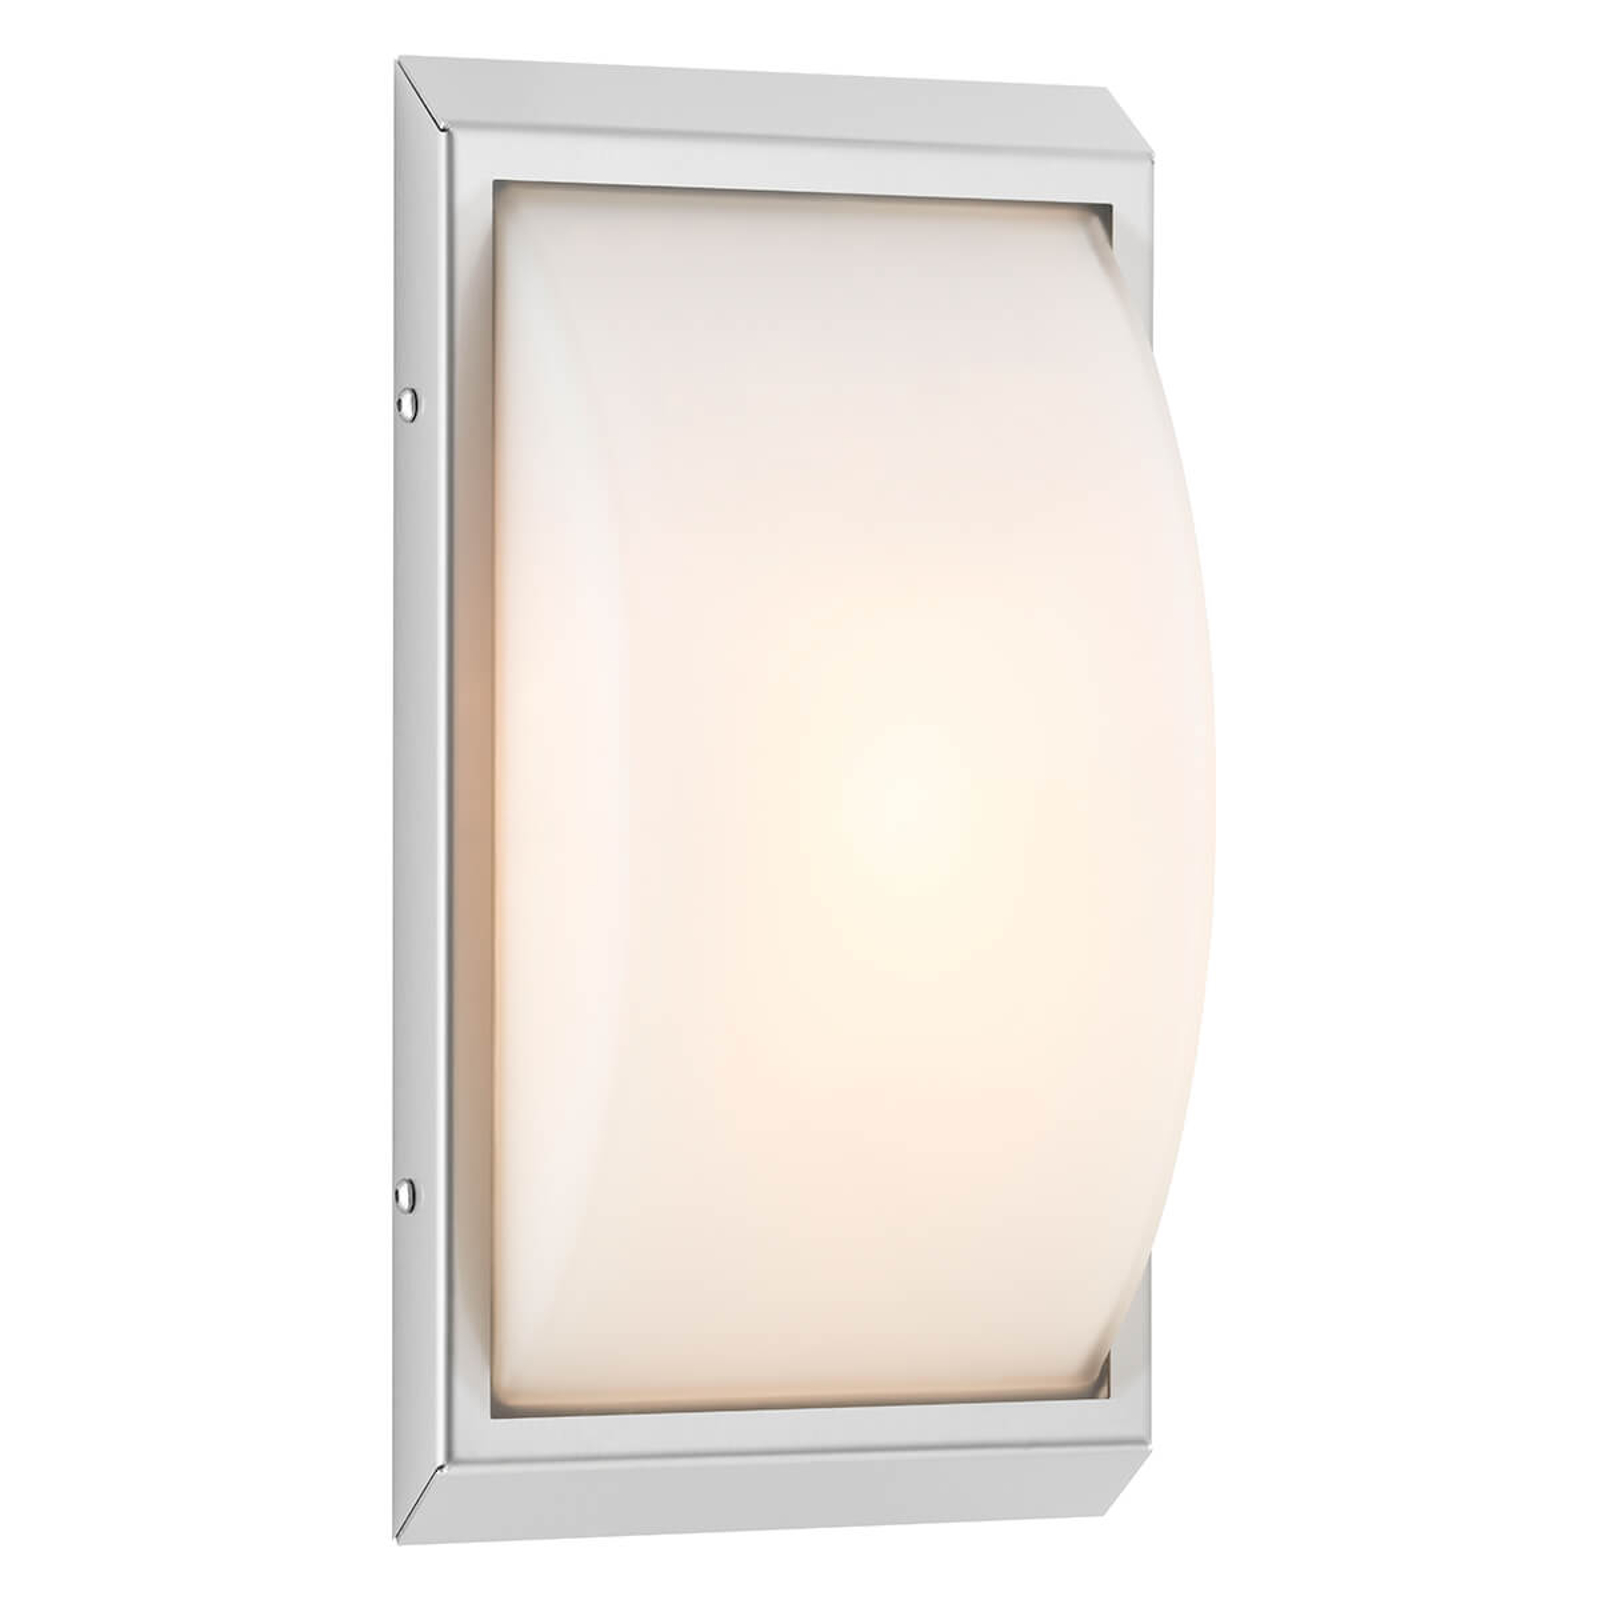 Laadukas LED-ulkoseinälamppu 052 tunnistimella